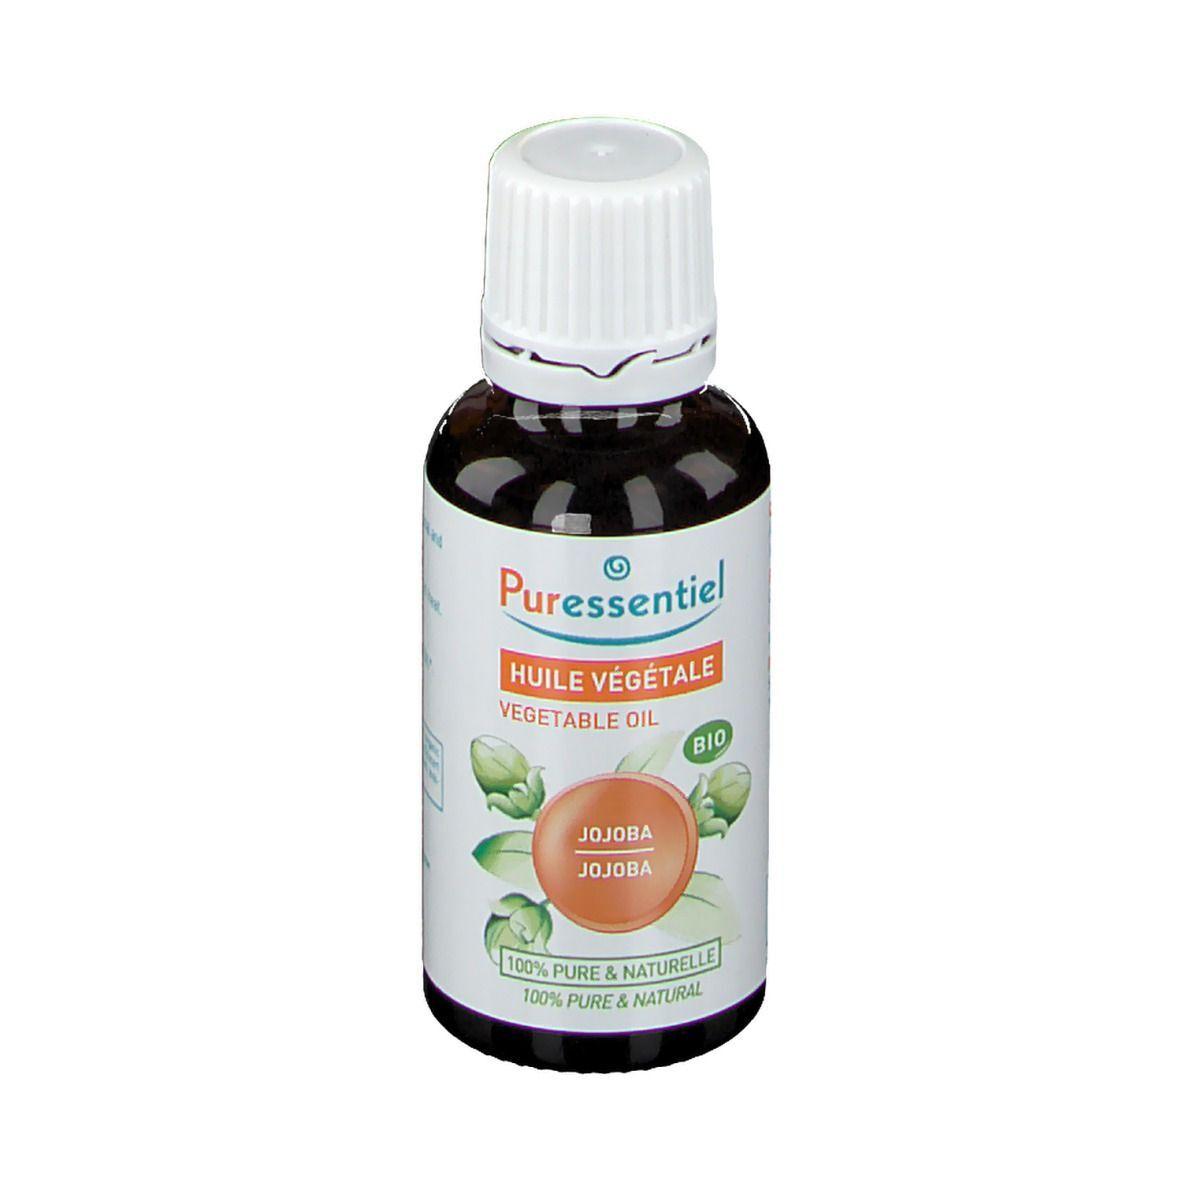 Puressentiel Huiles Végétales Jojoba Bio ml huile